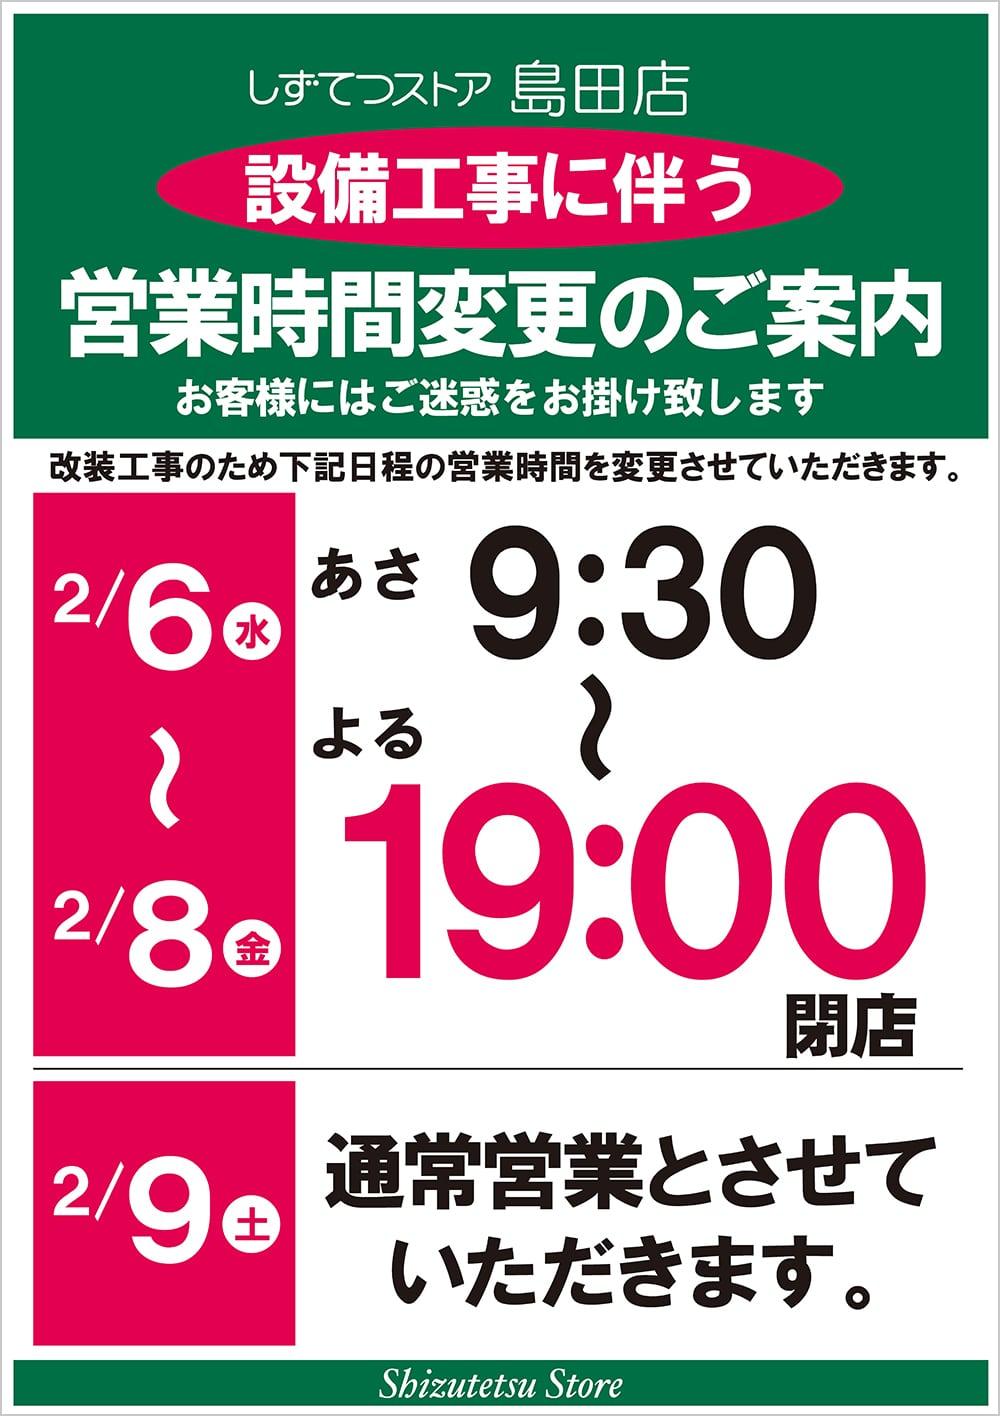 島田店_設備工事告知ポスター190206